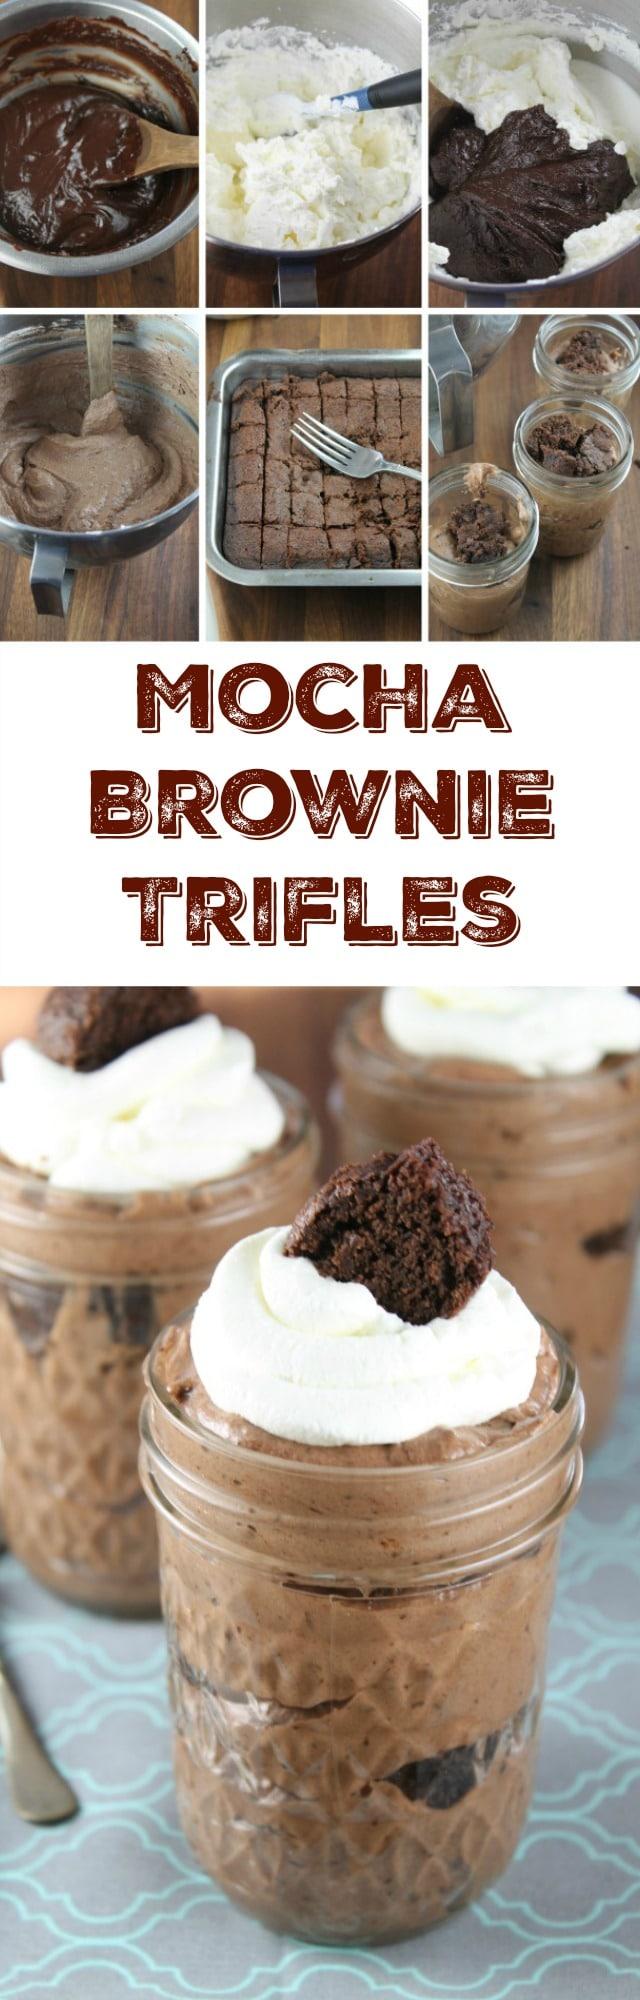 Recipe for Mocha Brownie Trifles found at MissintheKitchen.com #KACraftCoffee